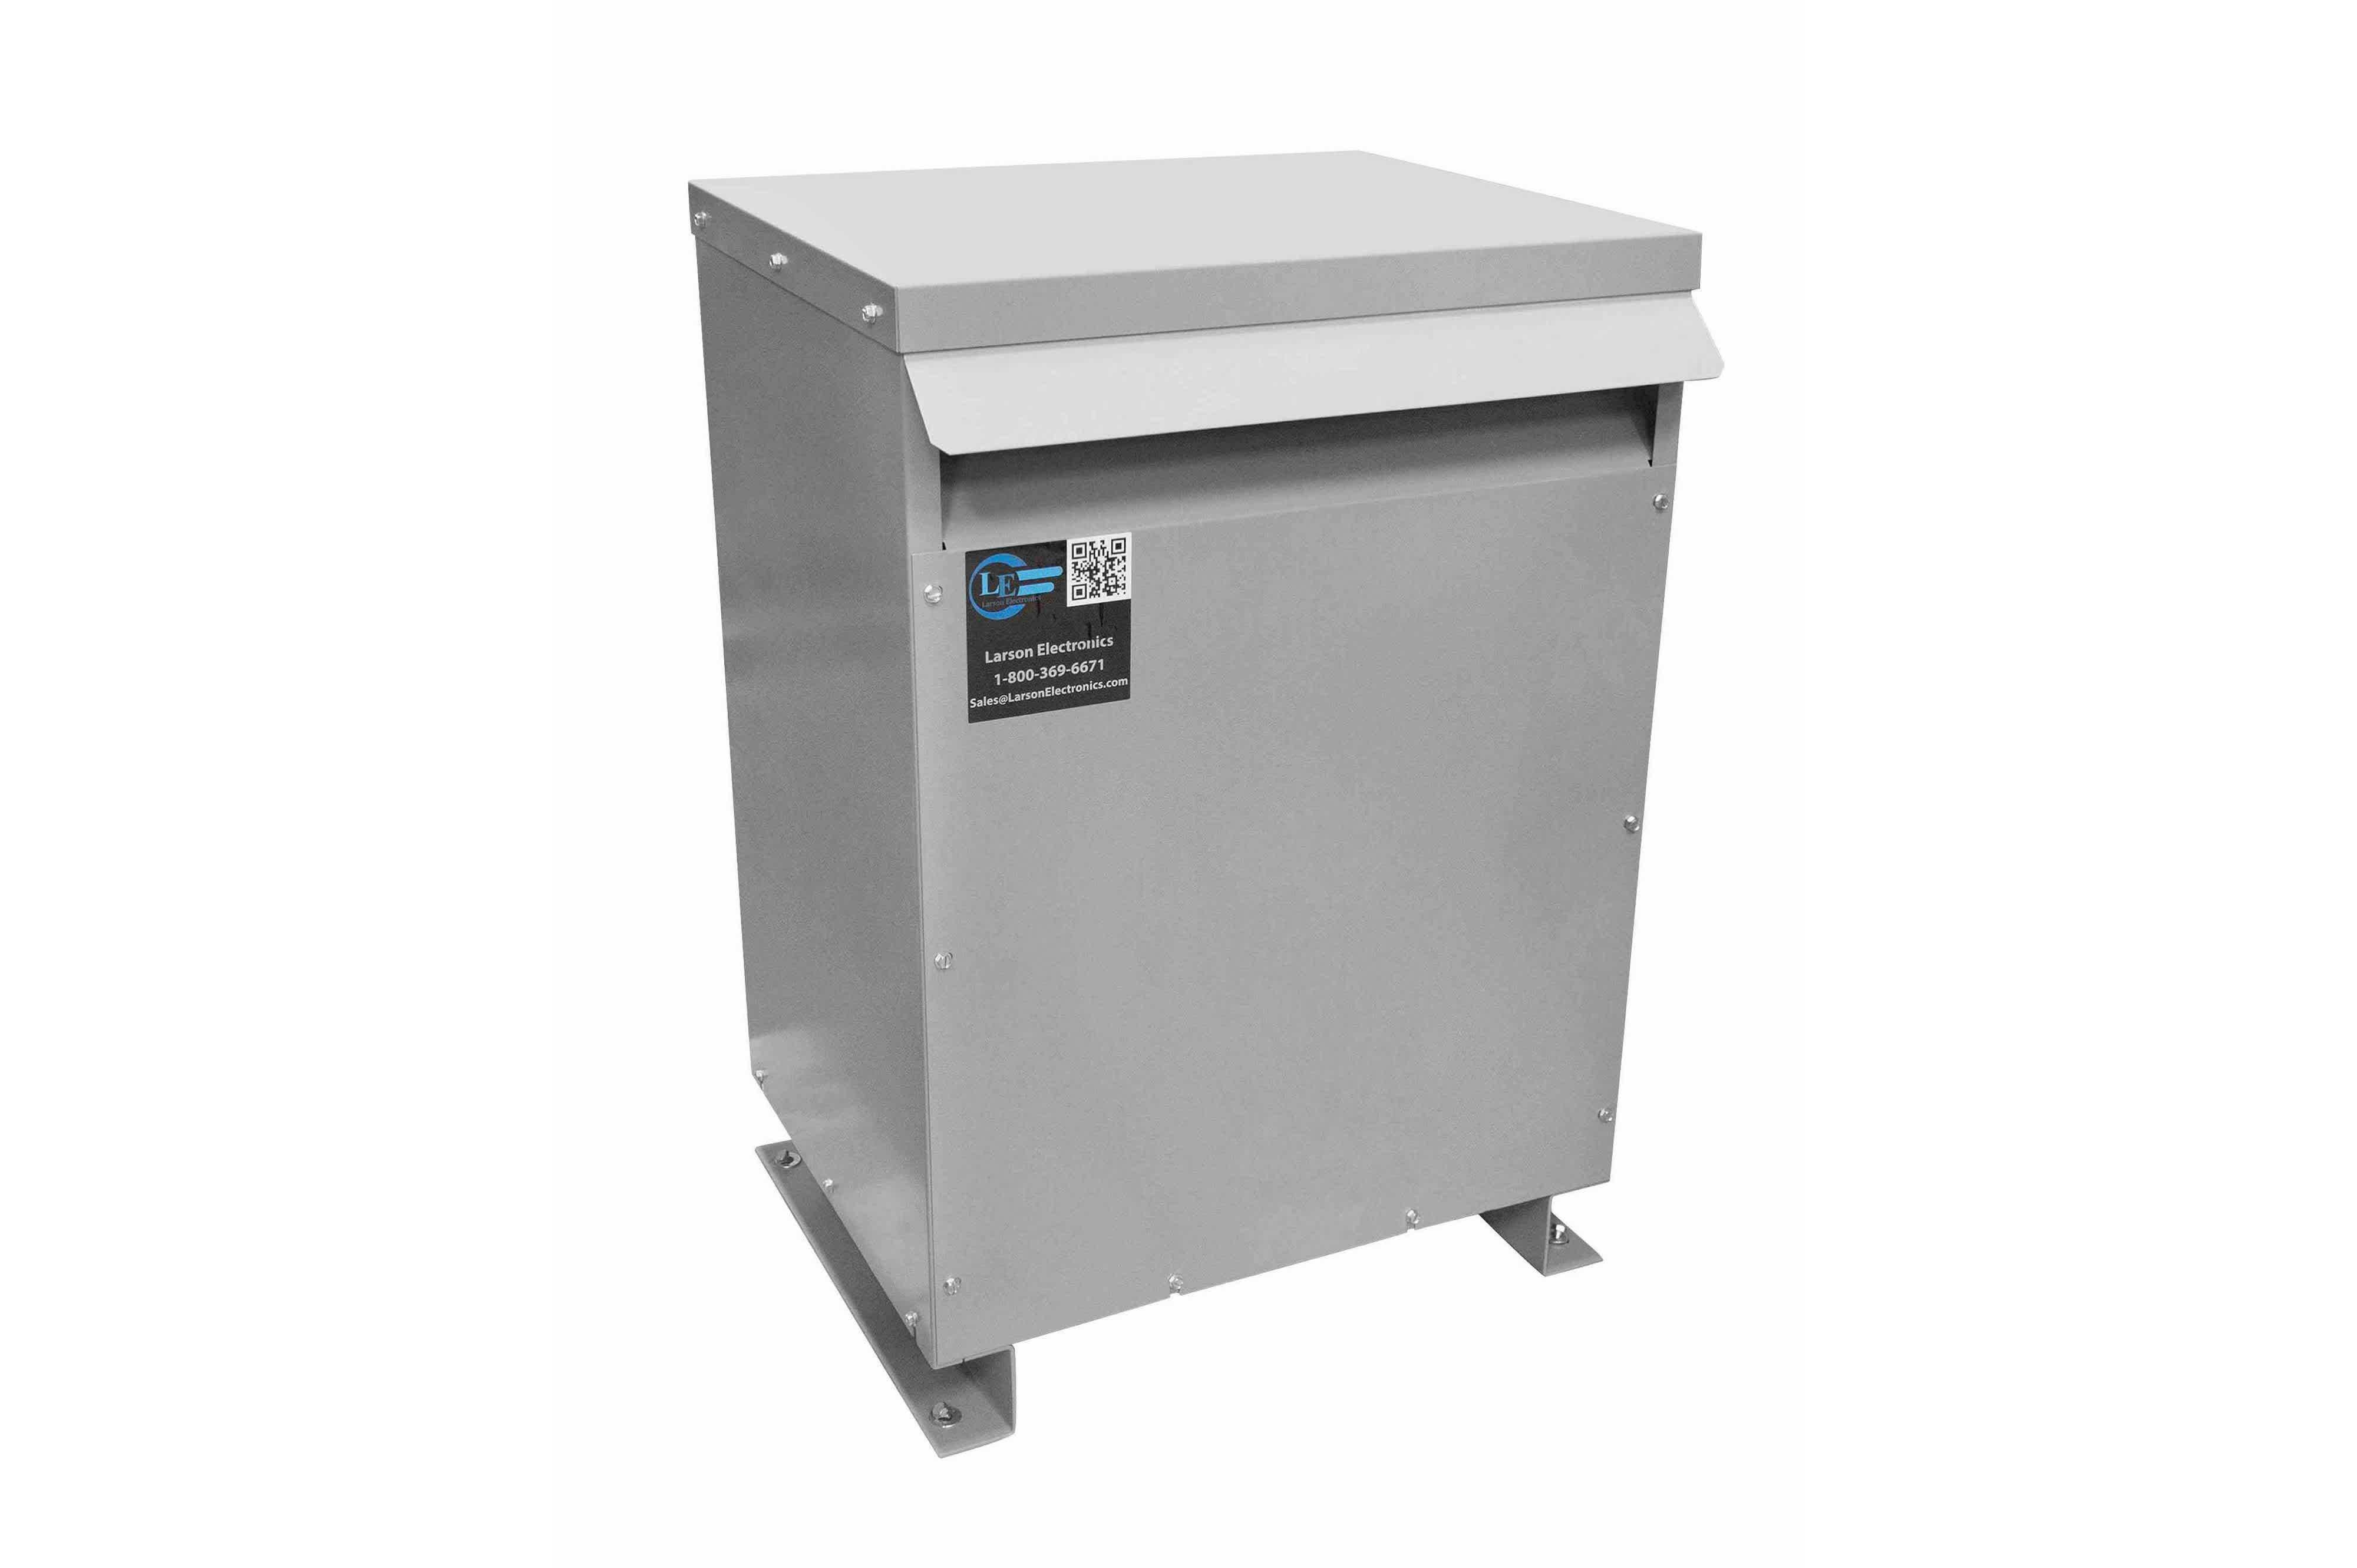 37.5 kVA 3PH Isolation Transformer, 460V Wye Primary, 208V Delta Secondary, N3R, Ventilated, 60 Hz